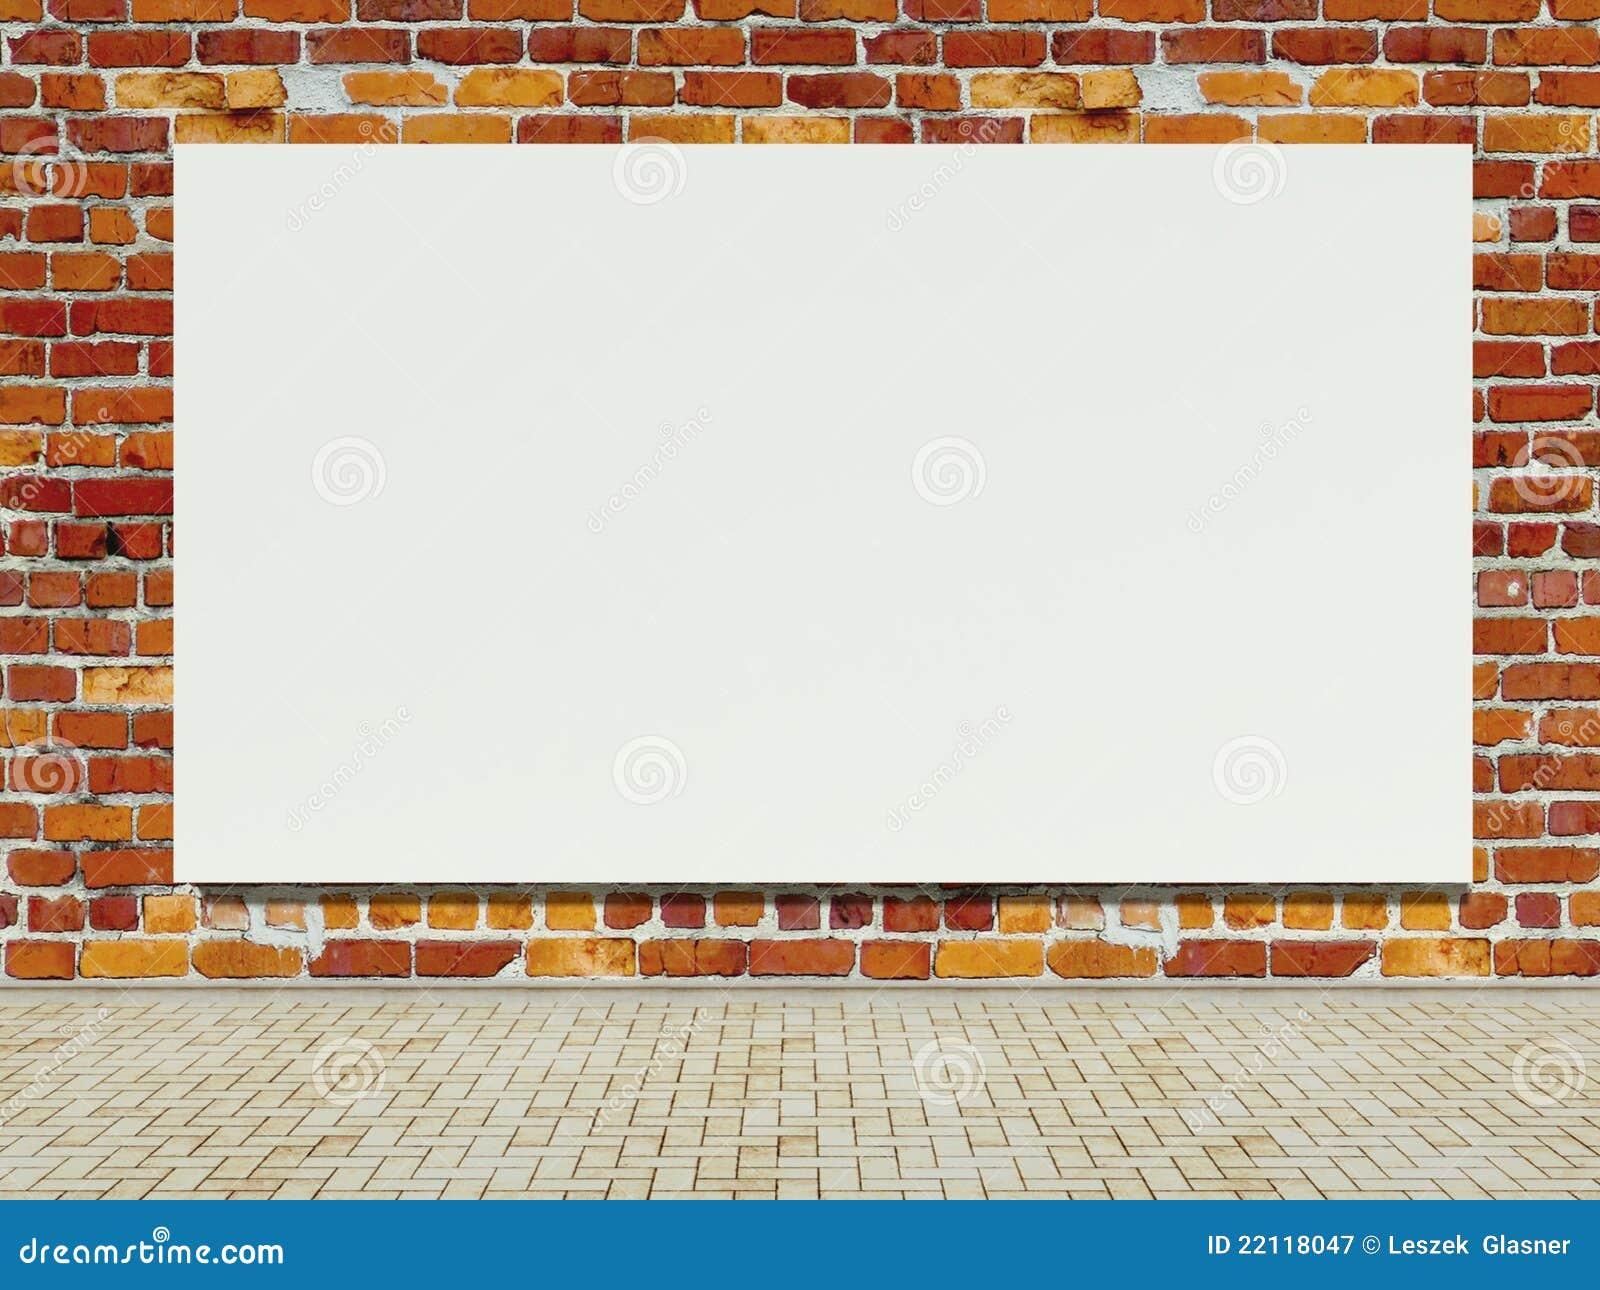 Blank Street Advertising Billboard On Brick Wall Royalty